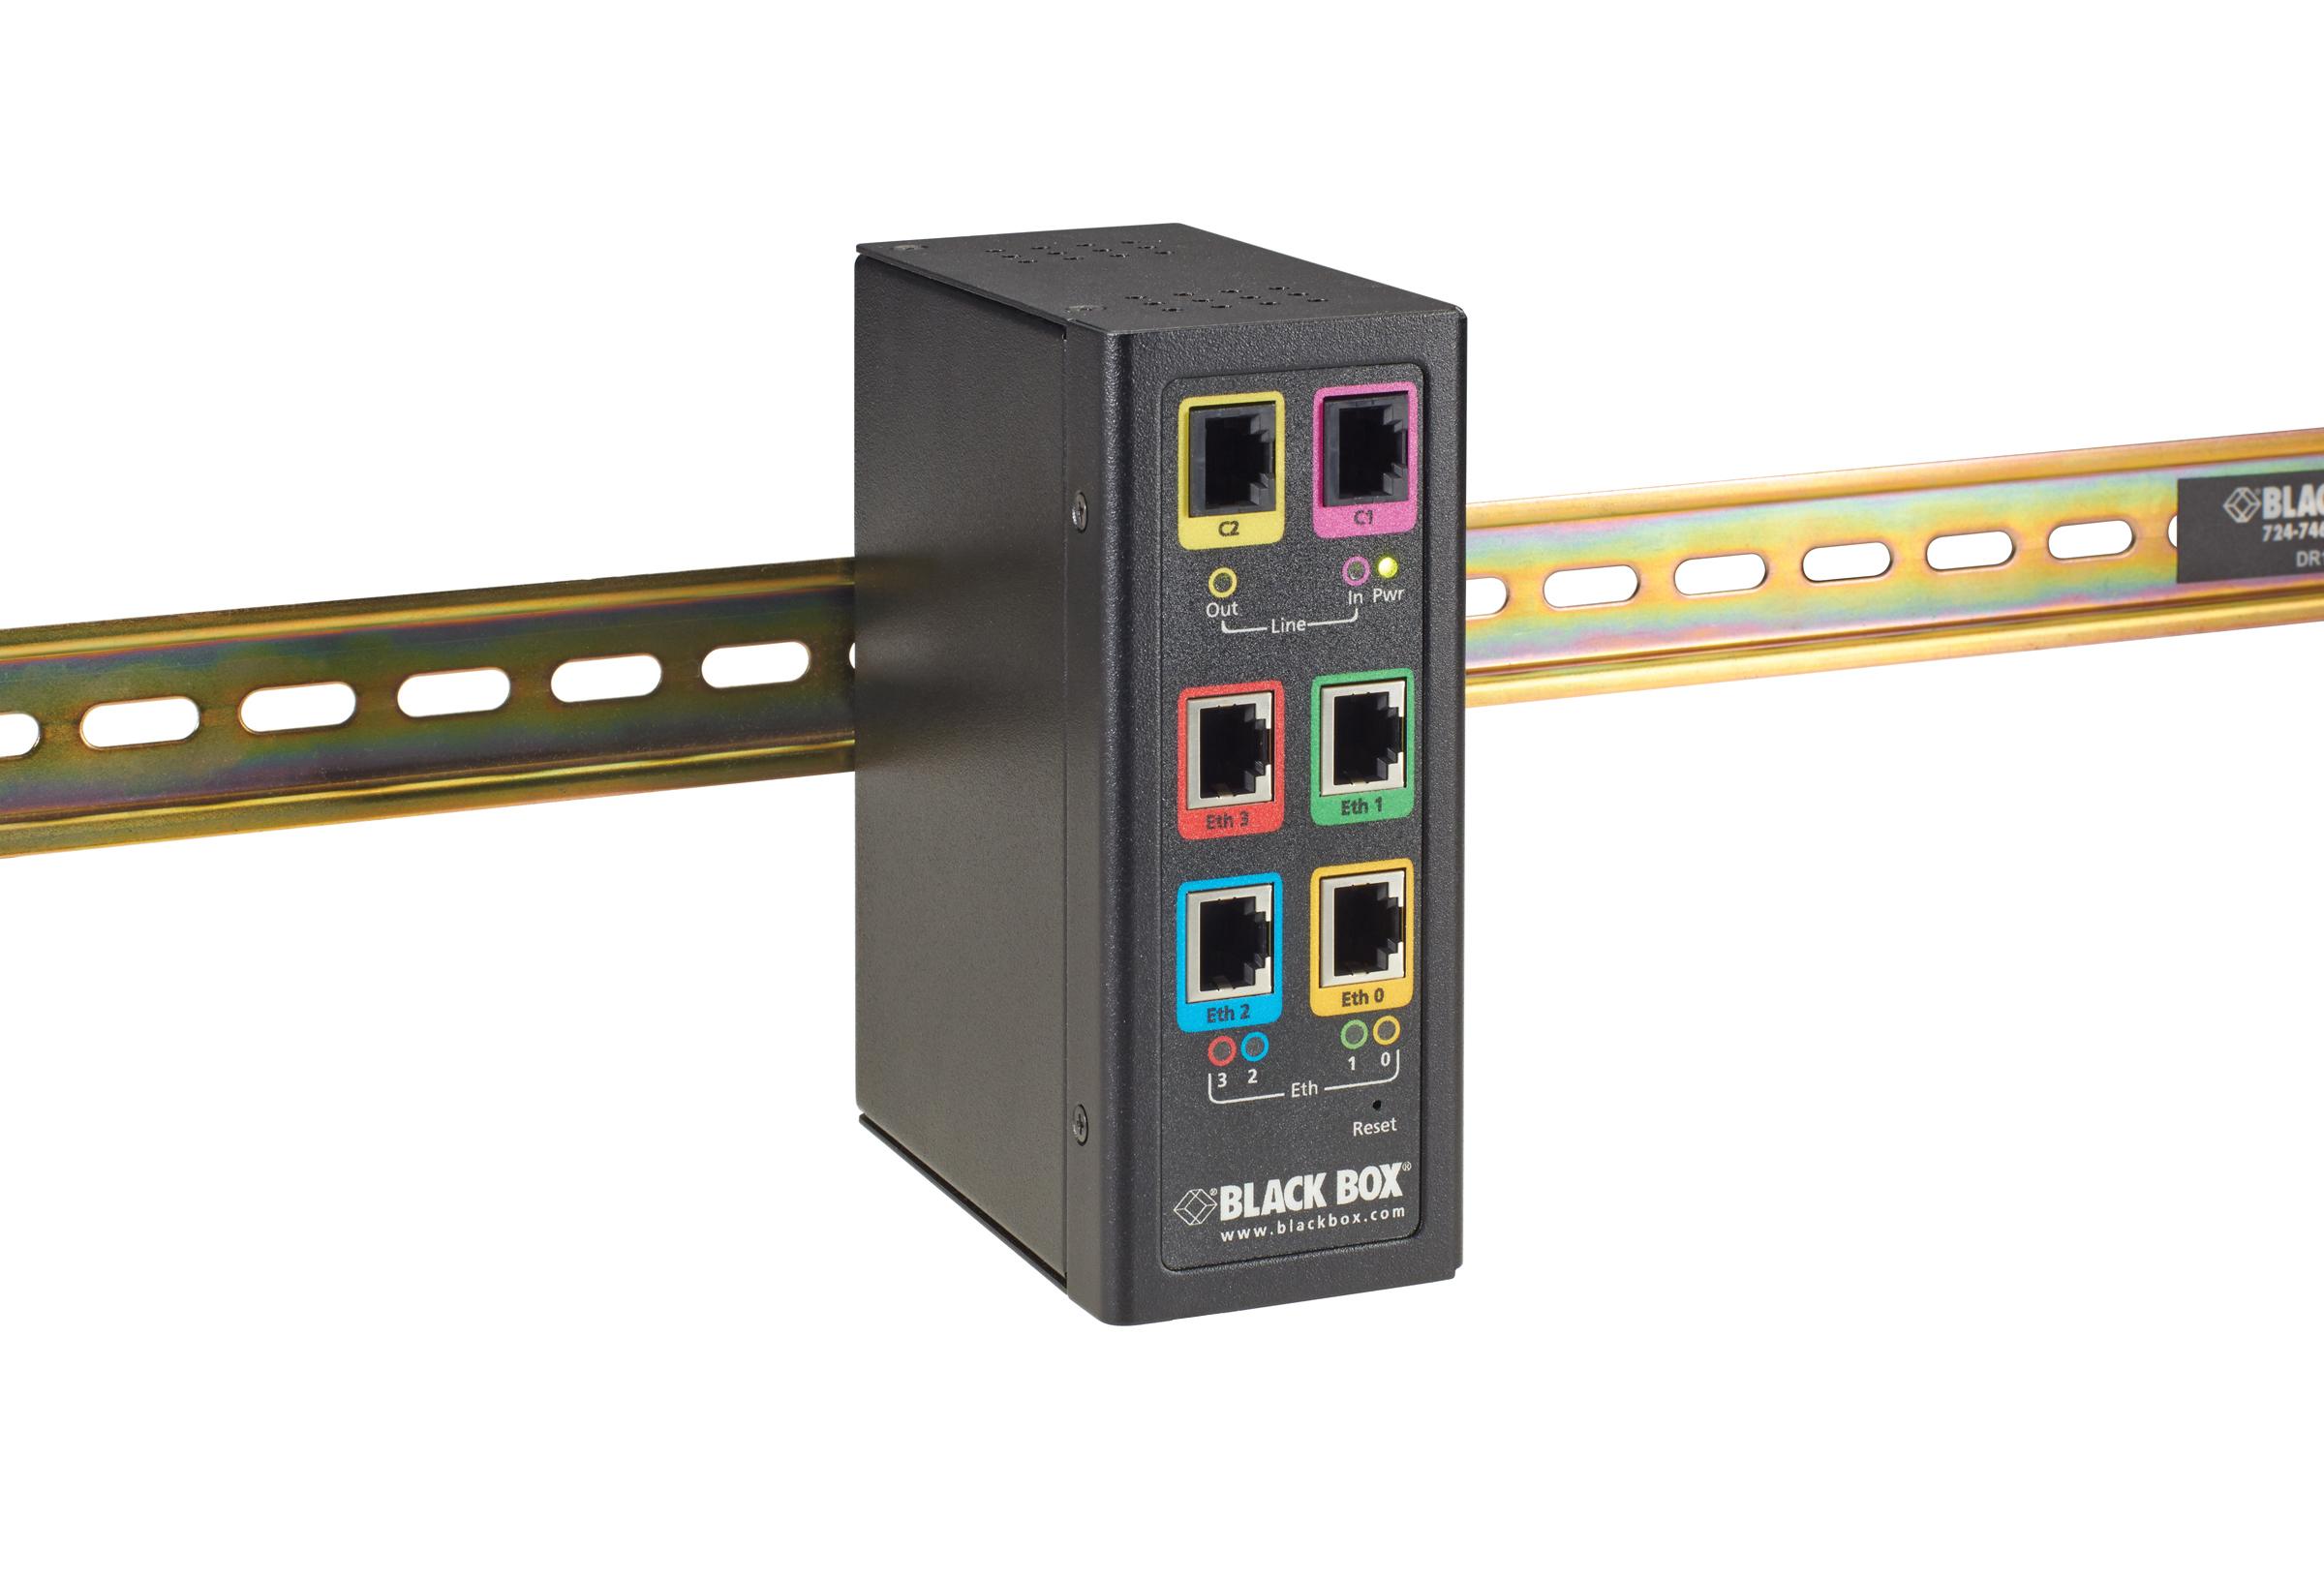 Industrial Ethernet Extender Multi-Drop Unit - G-SHDSL 2-Wire, 5.7 Mbps